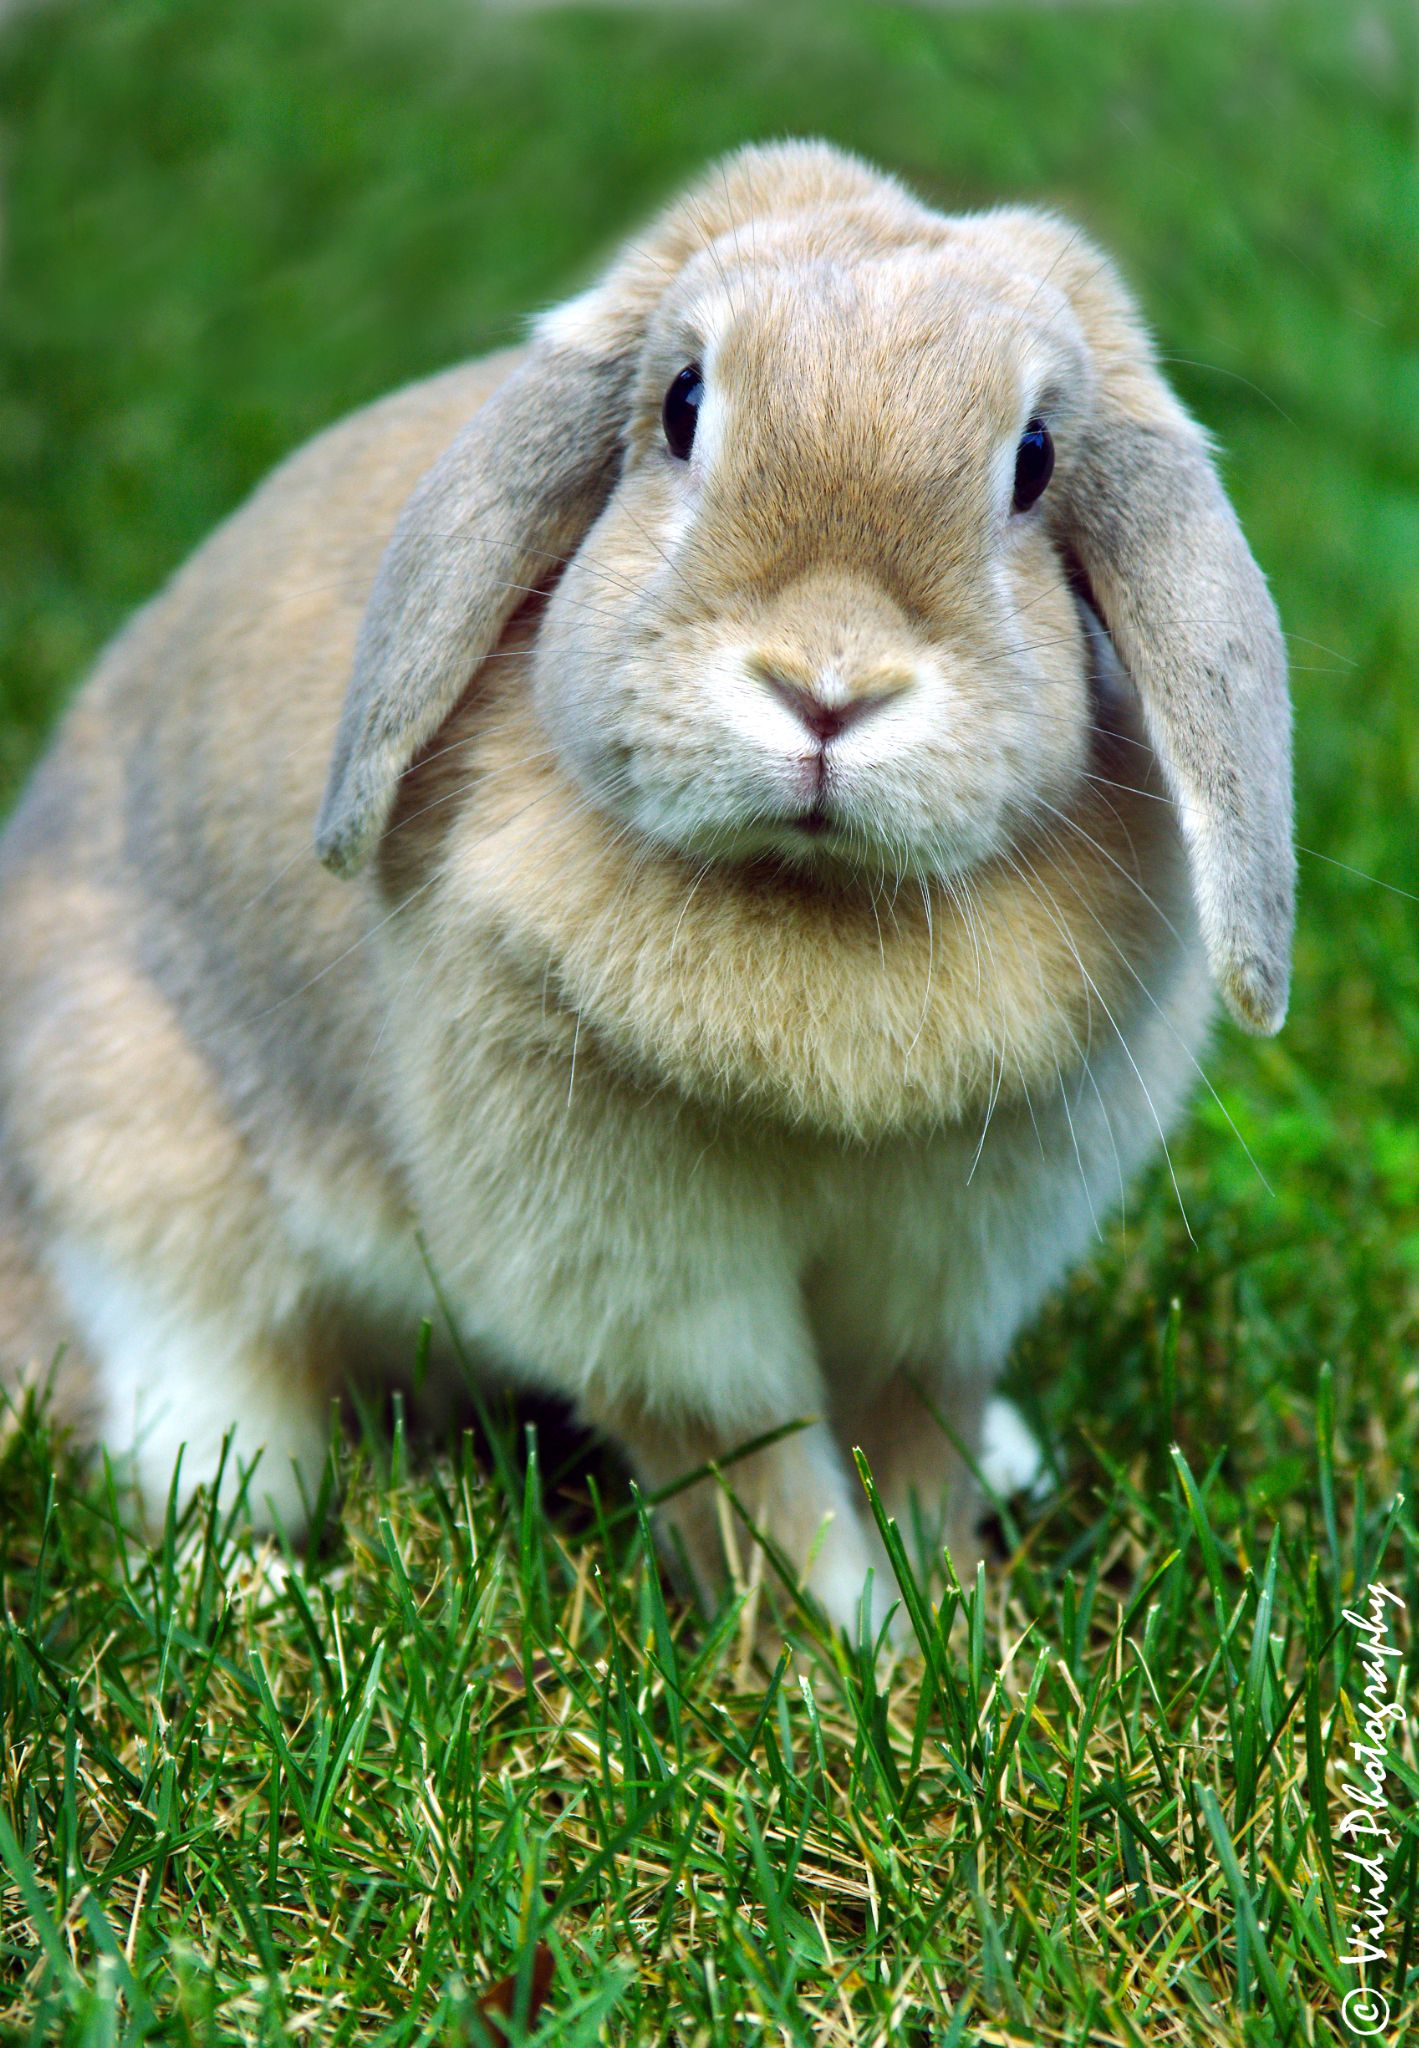 Some Bunny Love Me? by Judee Schofield